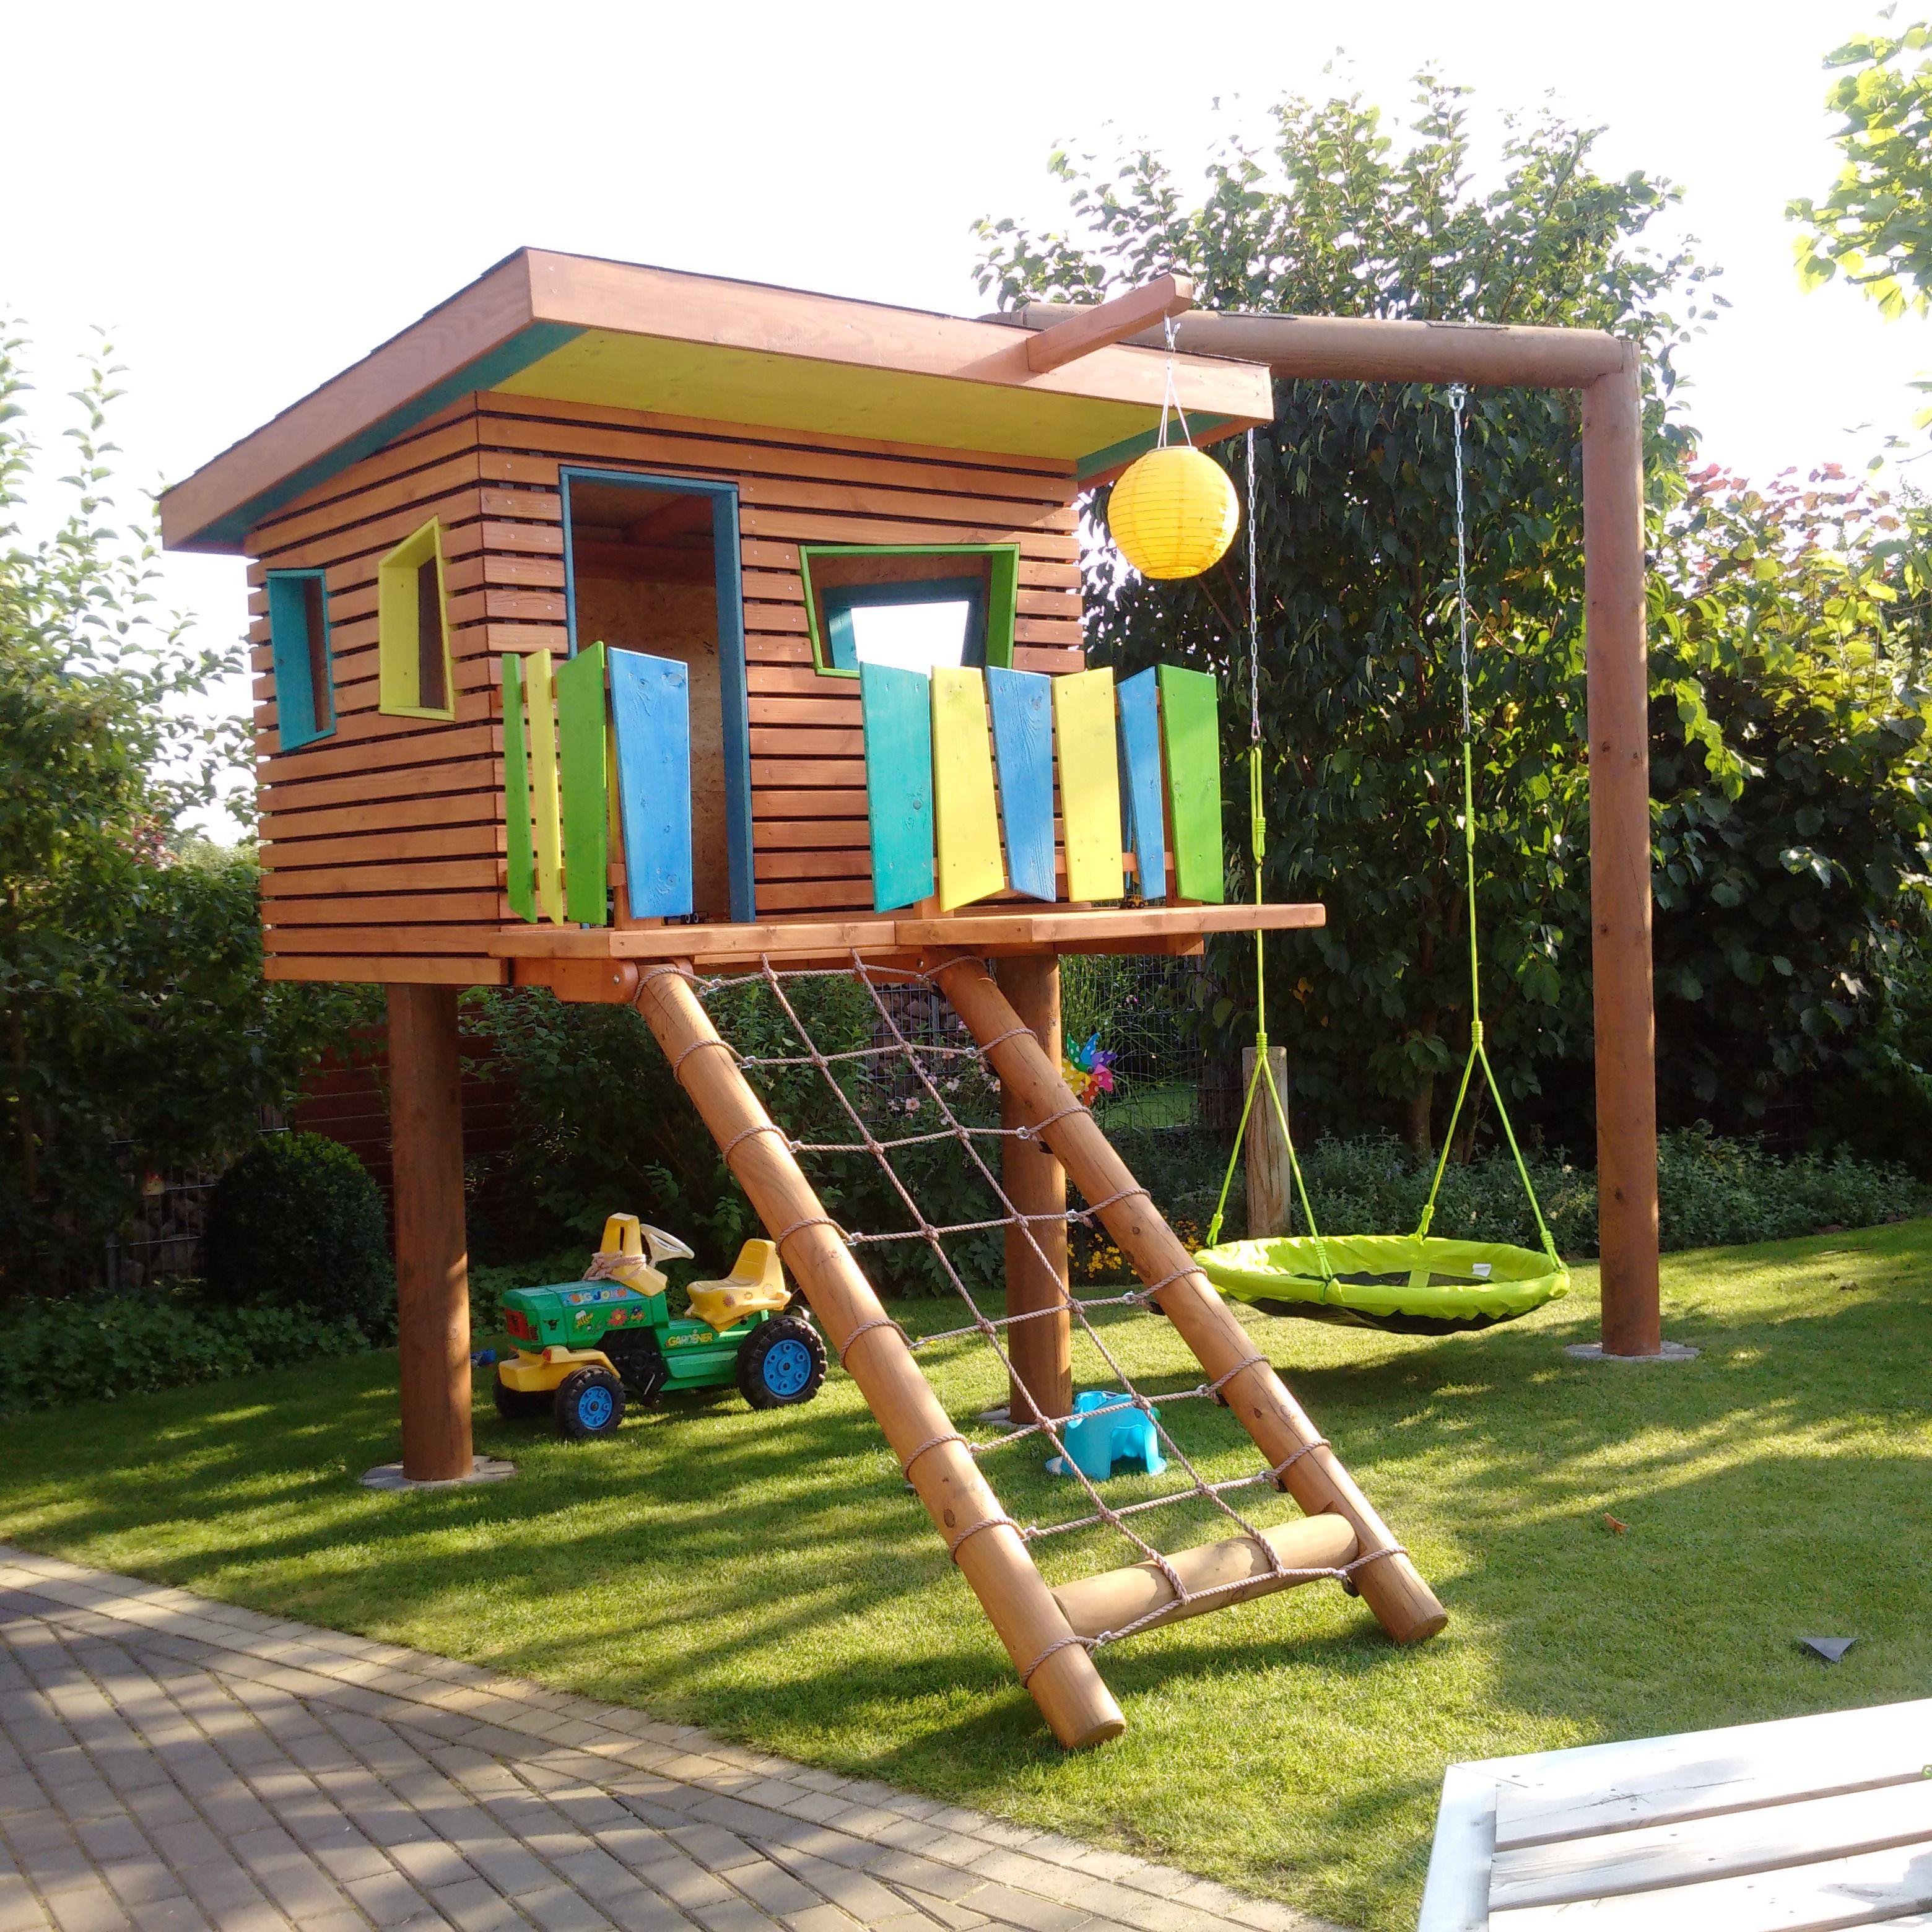 Kinderspielhaus im garten bauanleitung zum selber bauen beautiful houses - Garten selber bauen ...